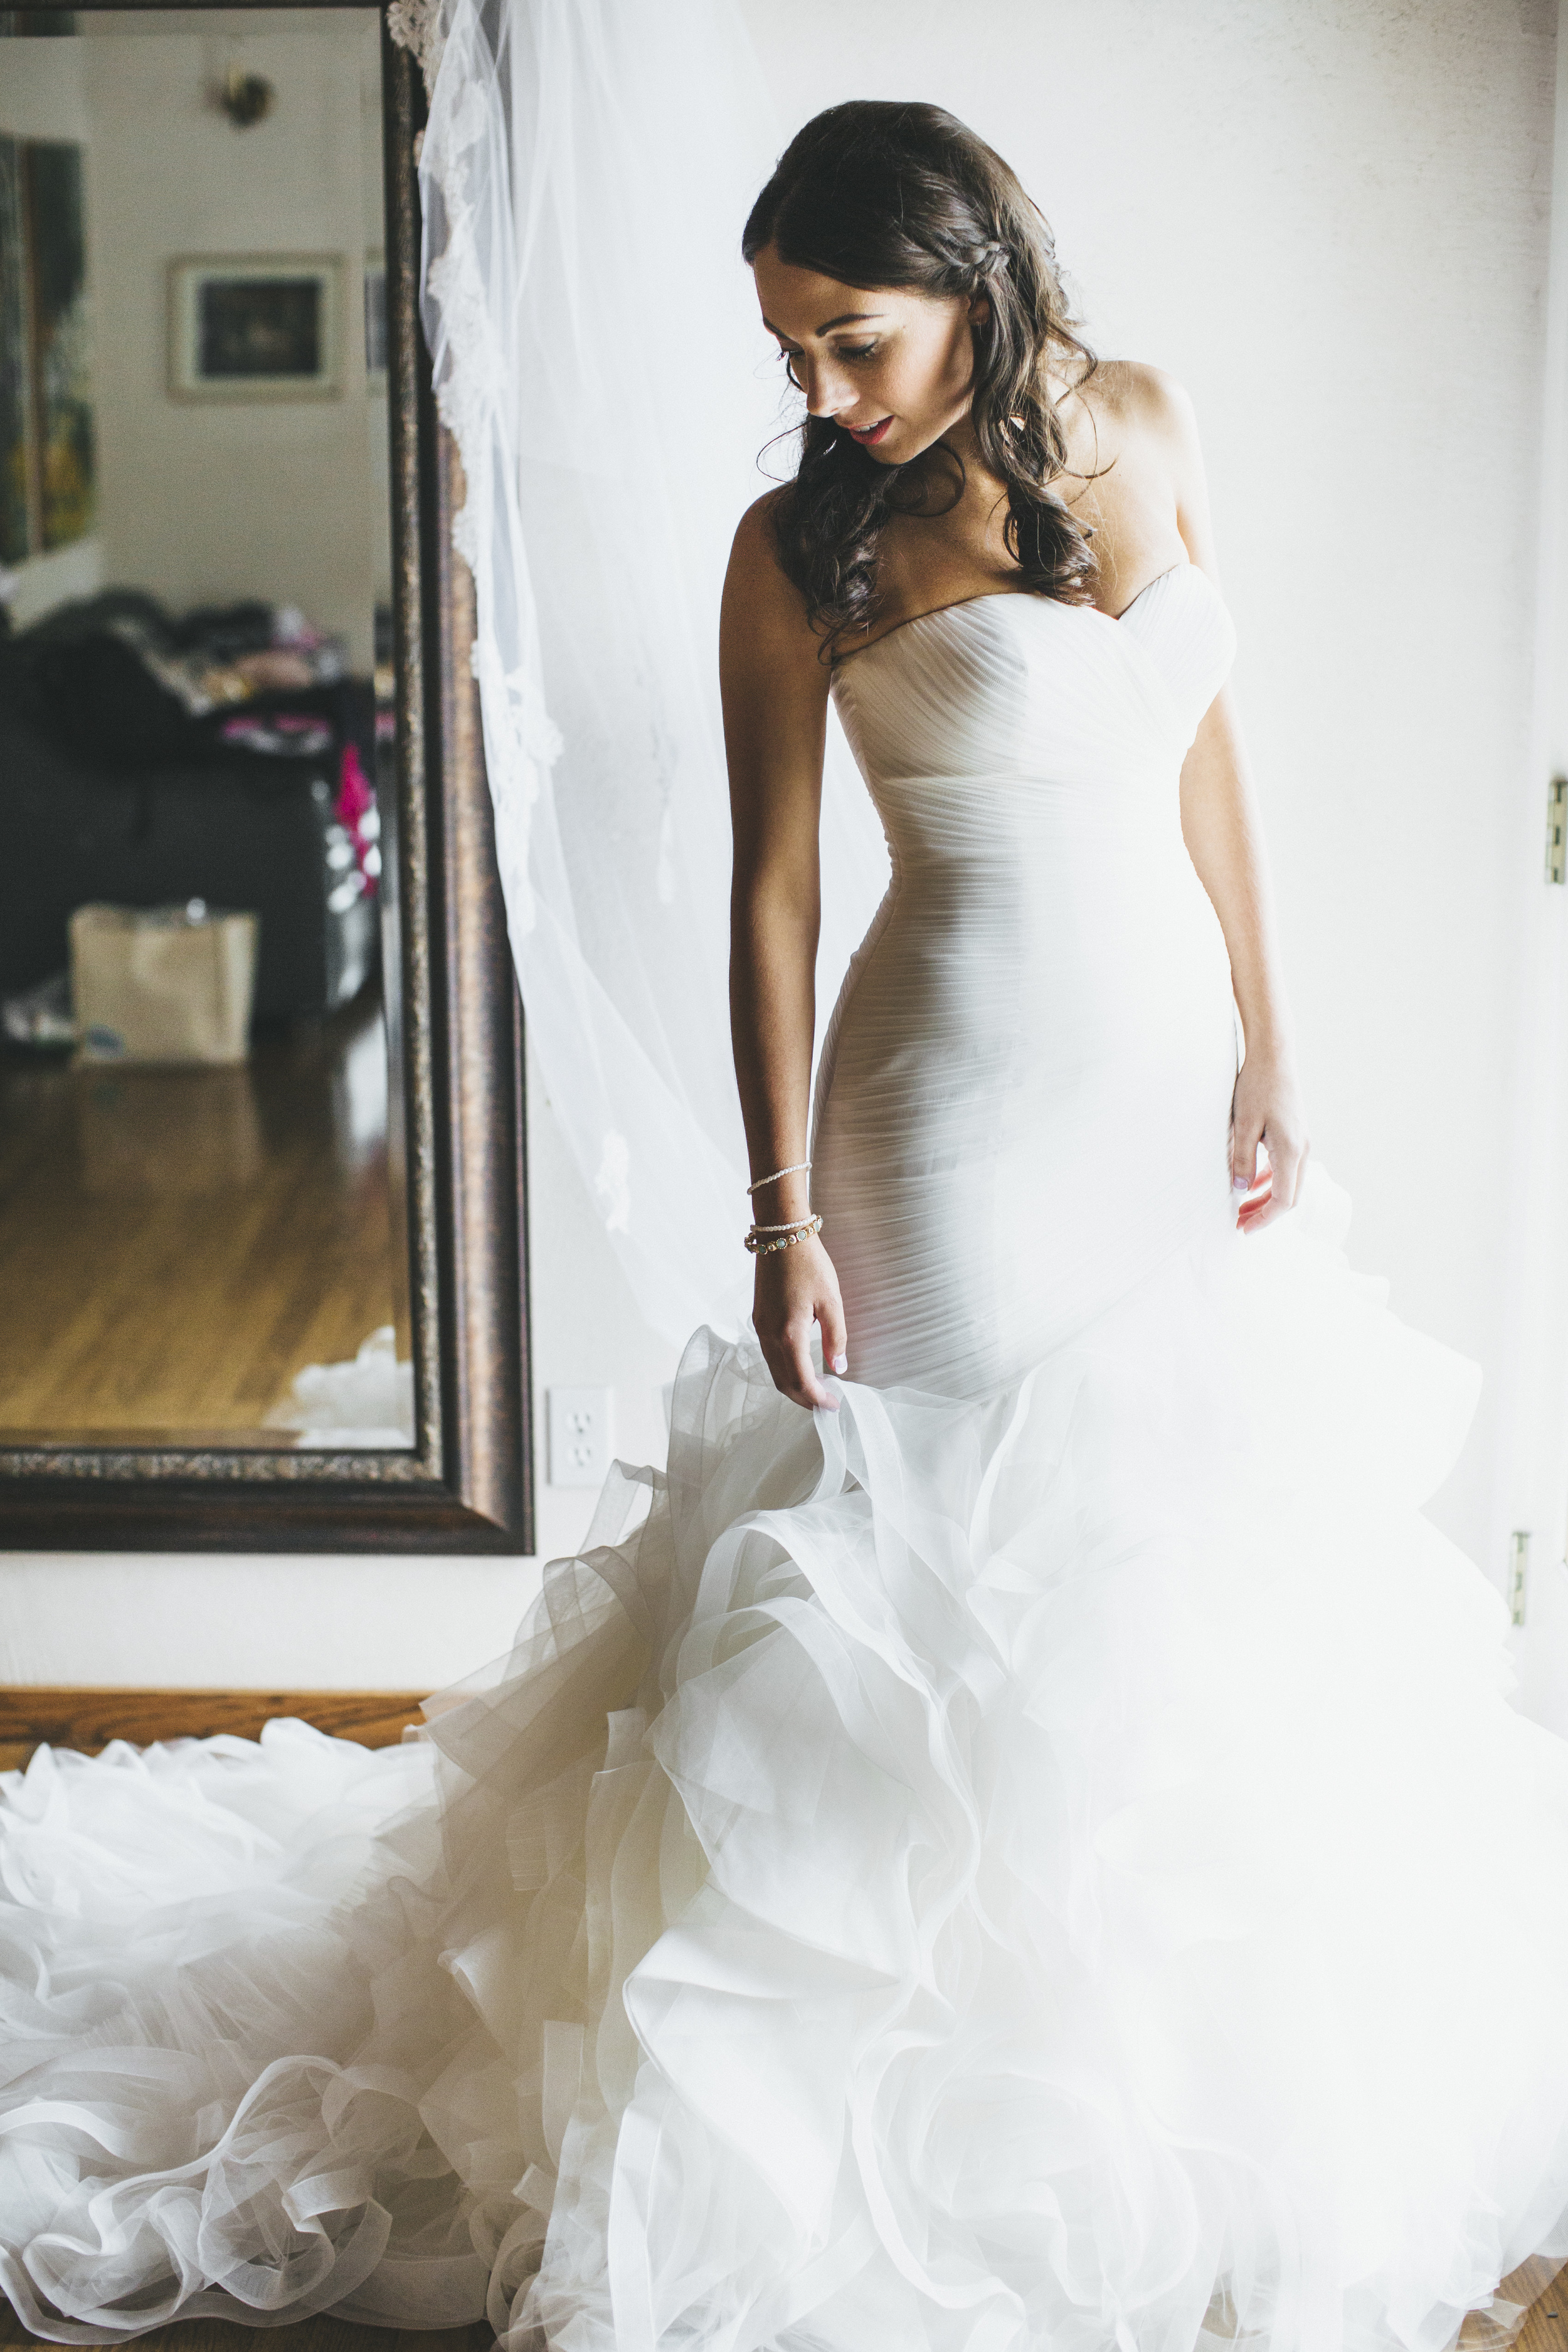 Mermaid Style Ruffled Wedding Gown